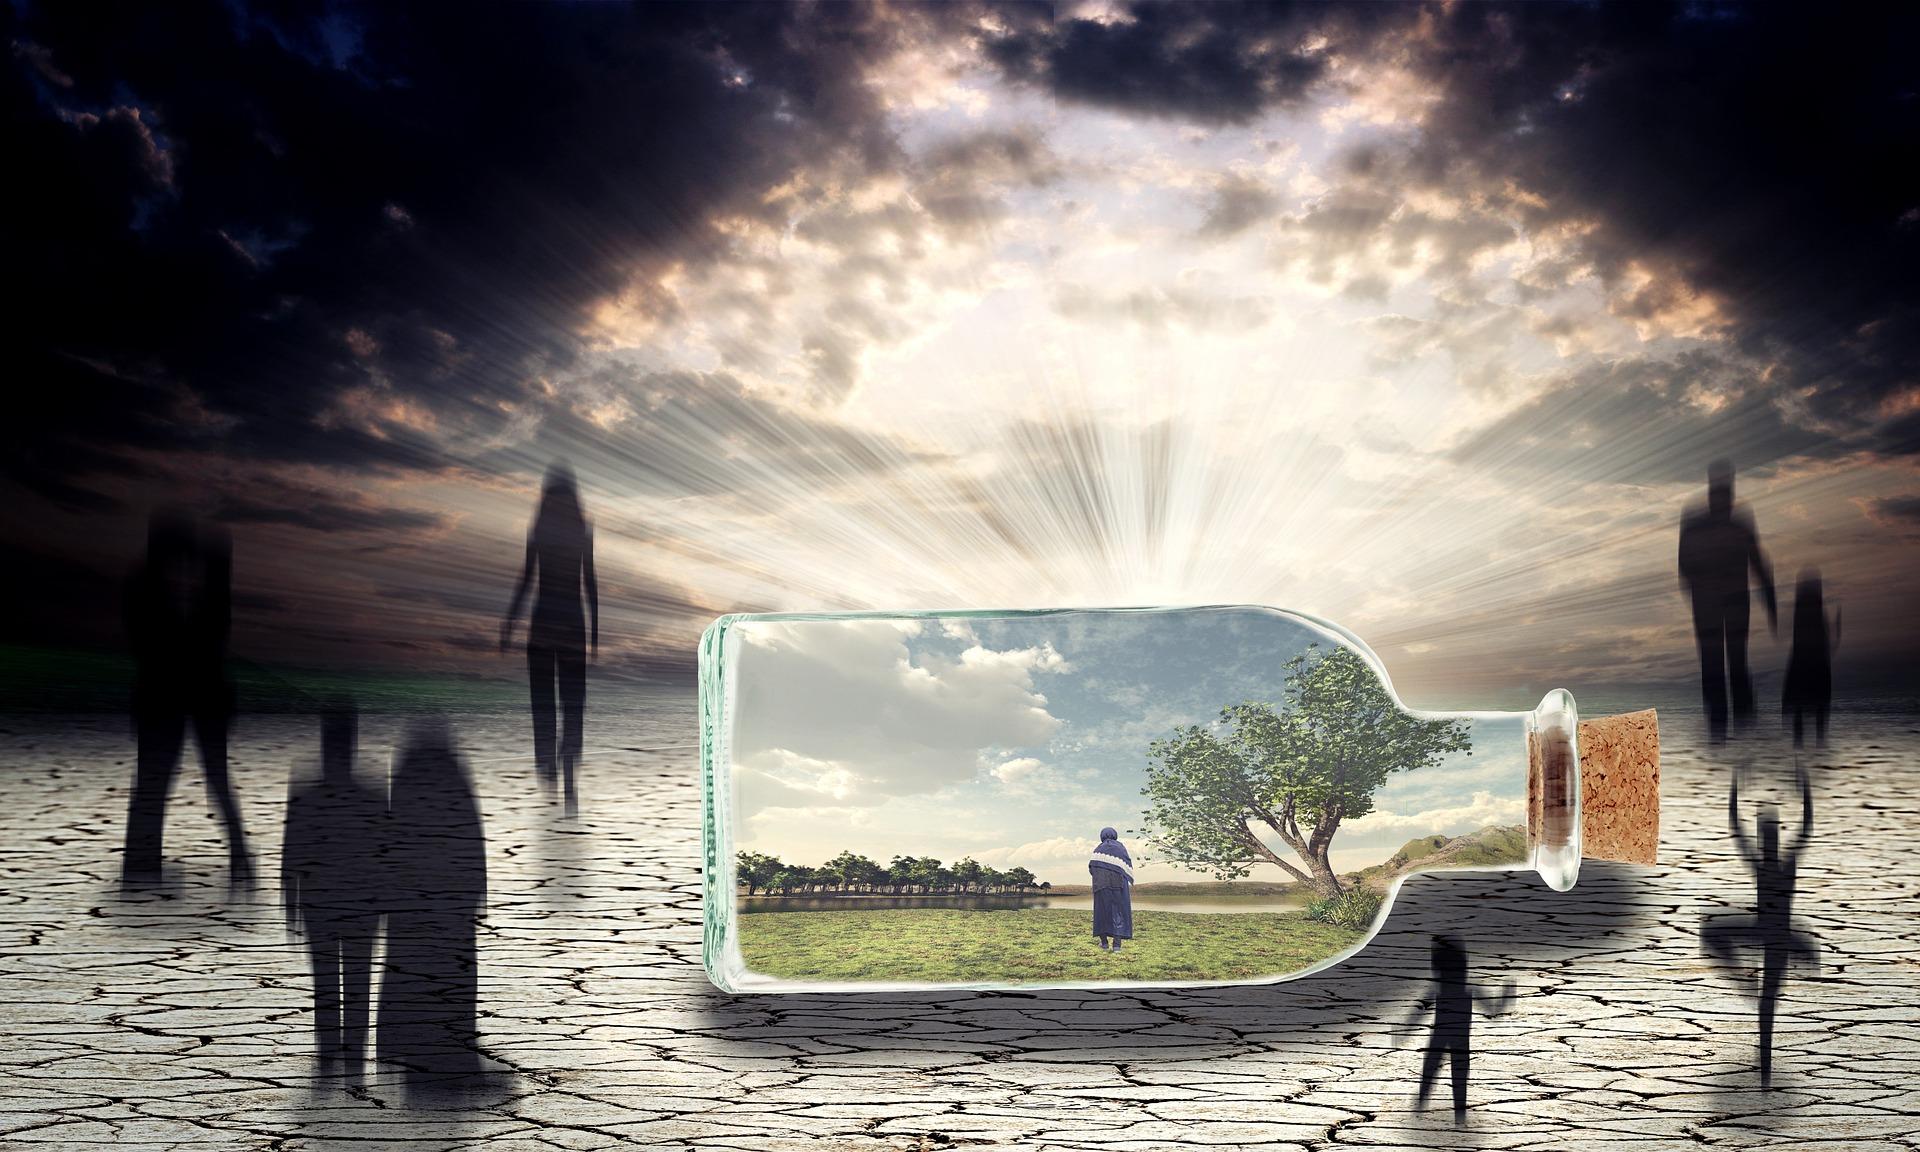 gandurile pozitive - sfatulparintilor.ro - pixabay_com - dementia-1528625_1920